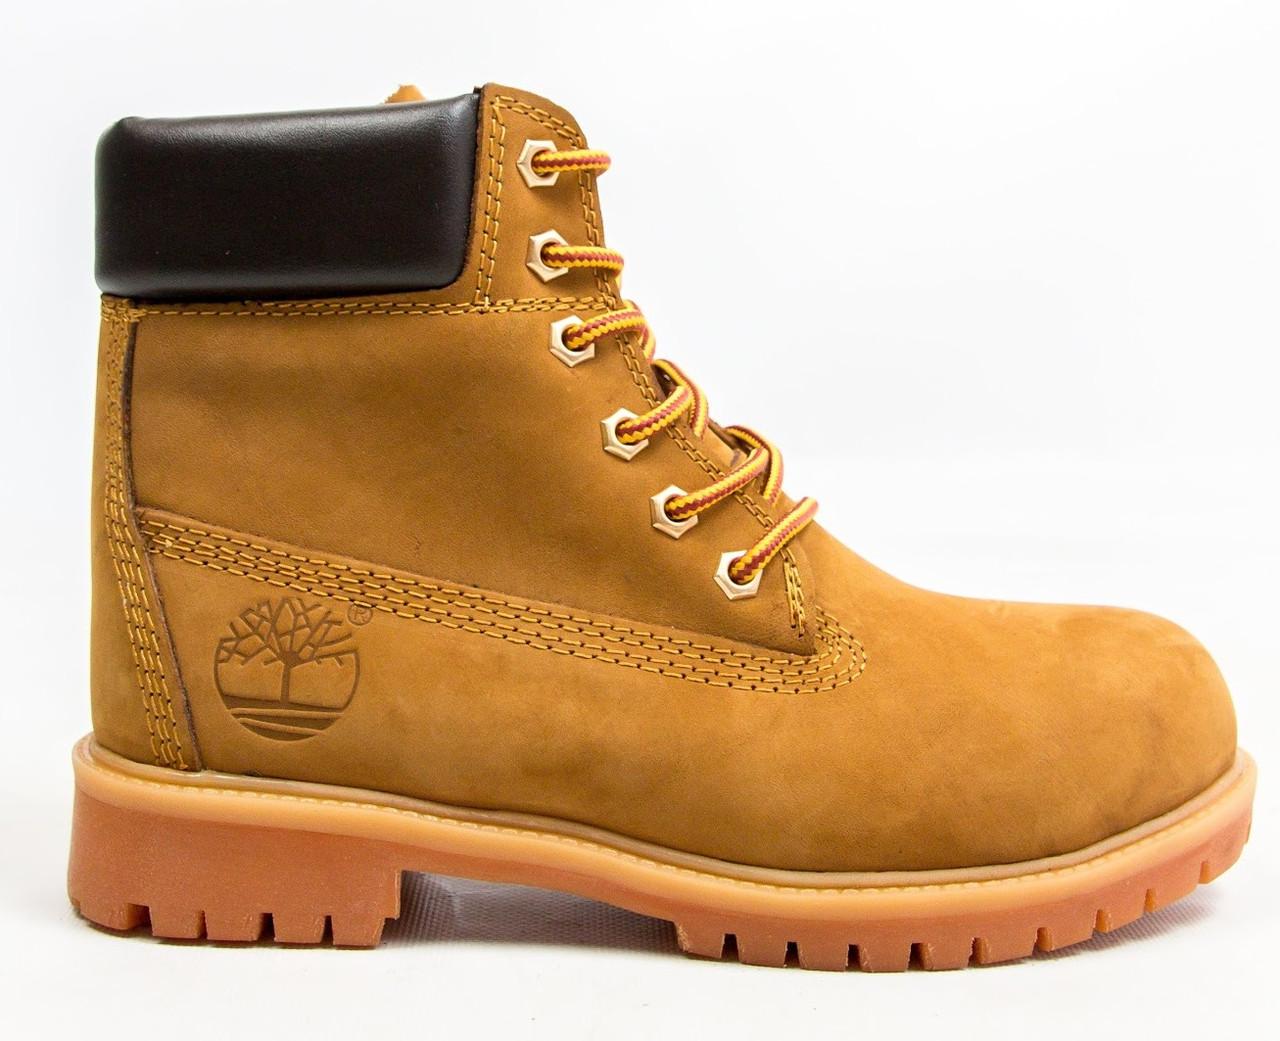 Зимние мужские ботинки Timberland classic 6 inch yellow без меха (Реплика  ААА+) - 30ed22d97c7